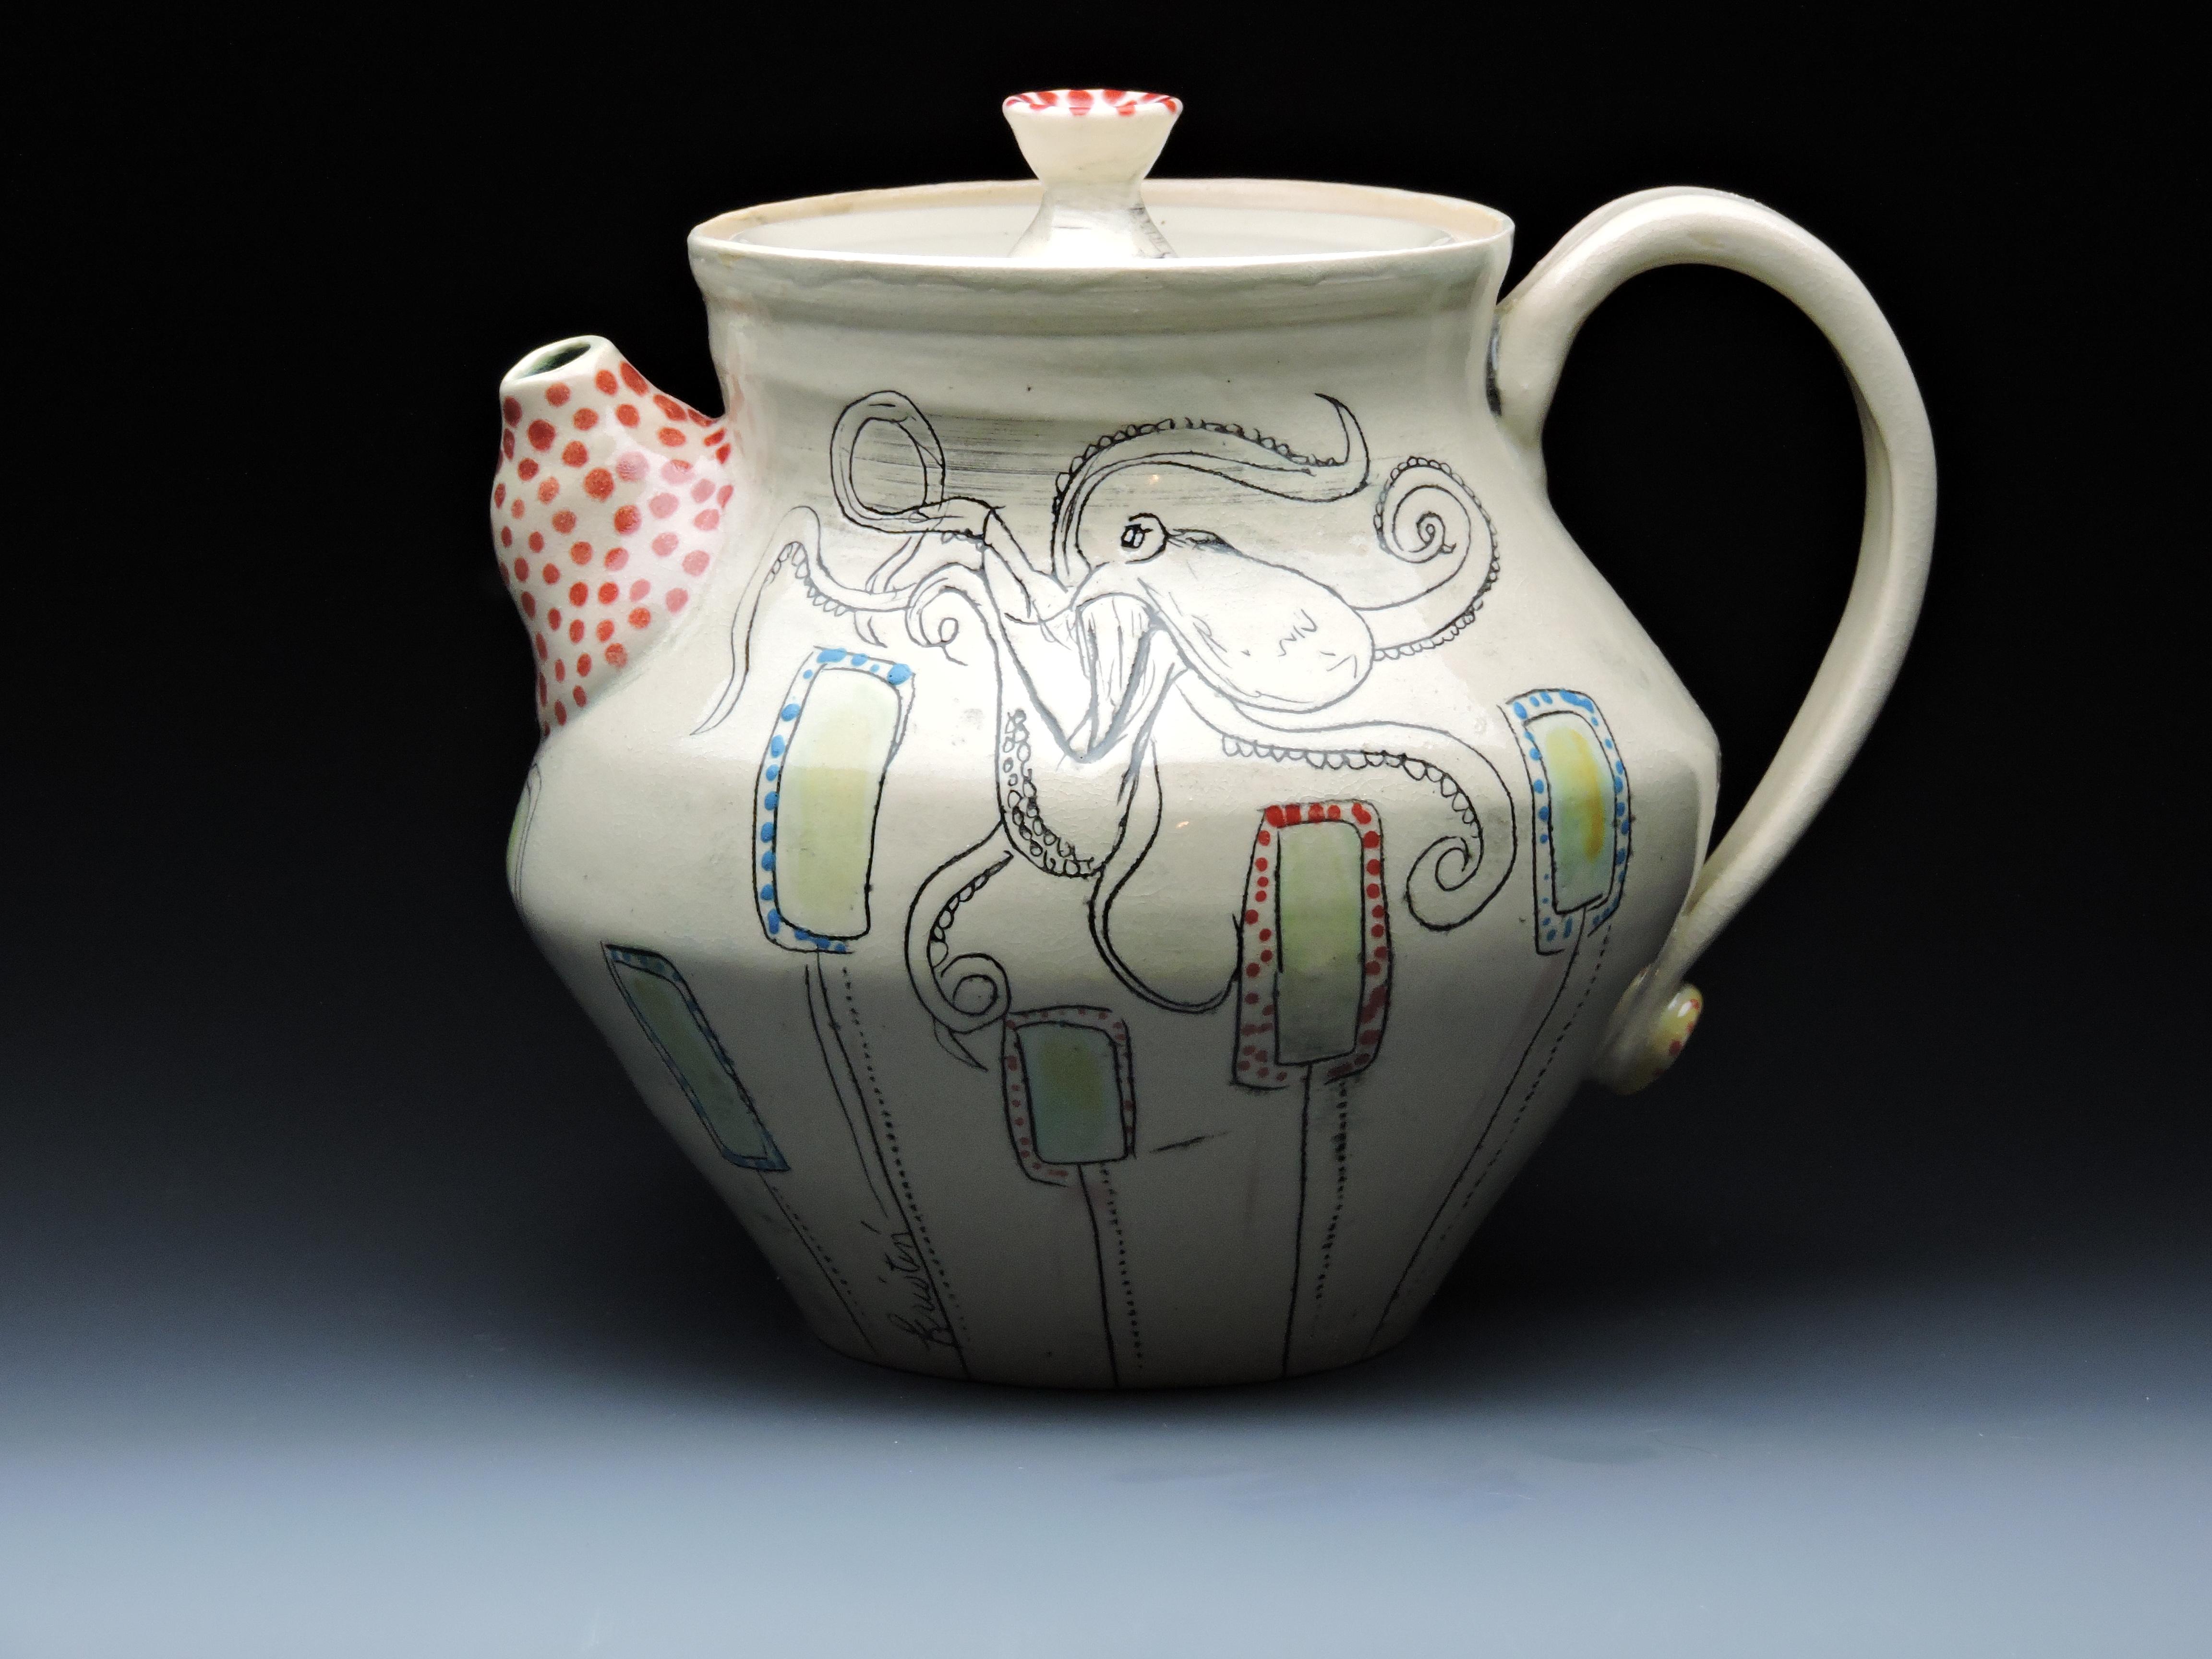 Octopus Teapot